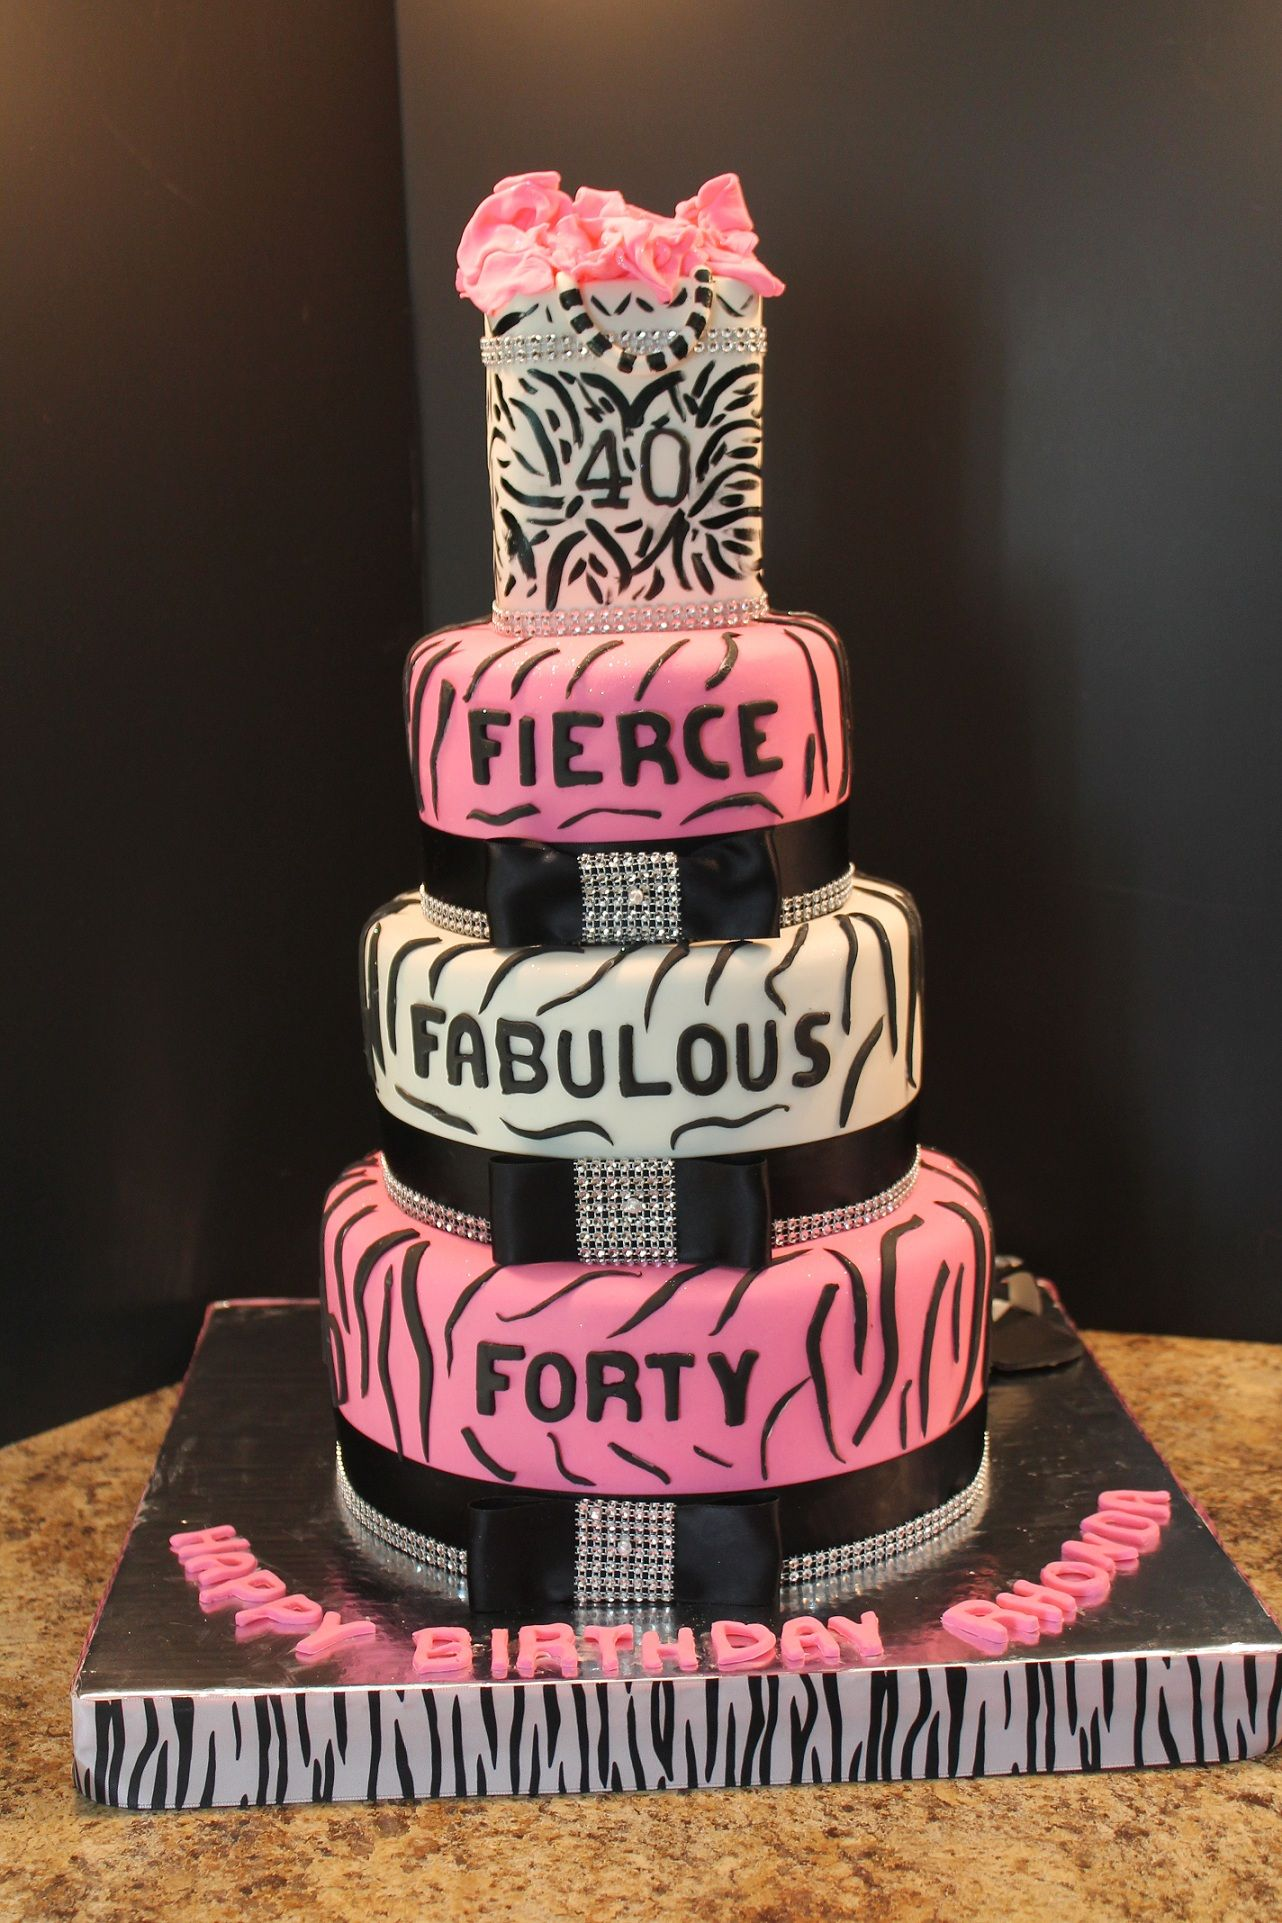 Thbirthdaycake Th Birthday Cake  Birthday Cakes - 35th birthday cake ideas